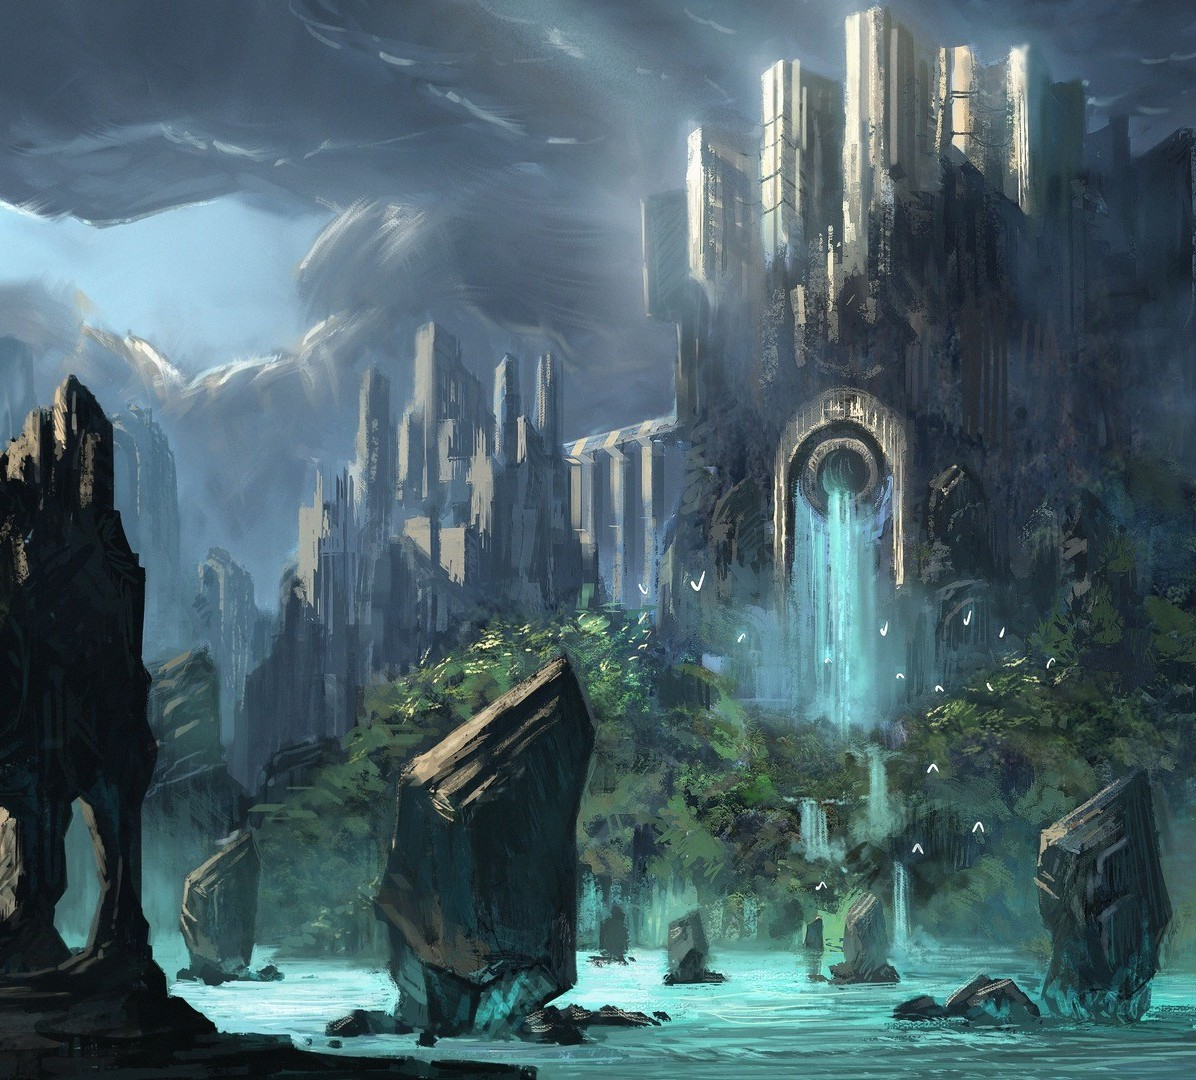 fantasy-nature-wallpaper-hd